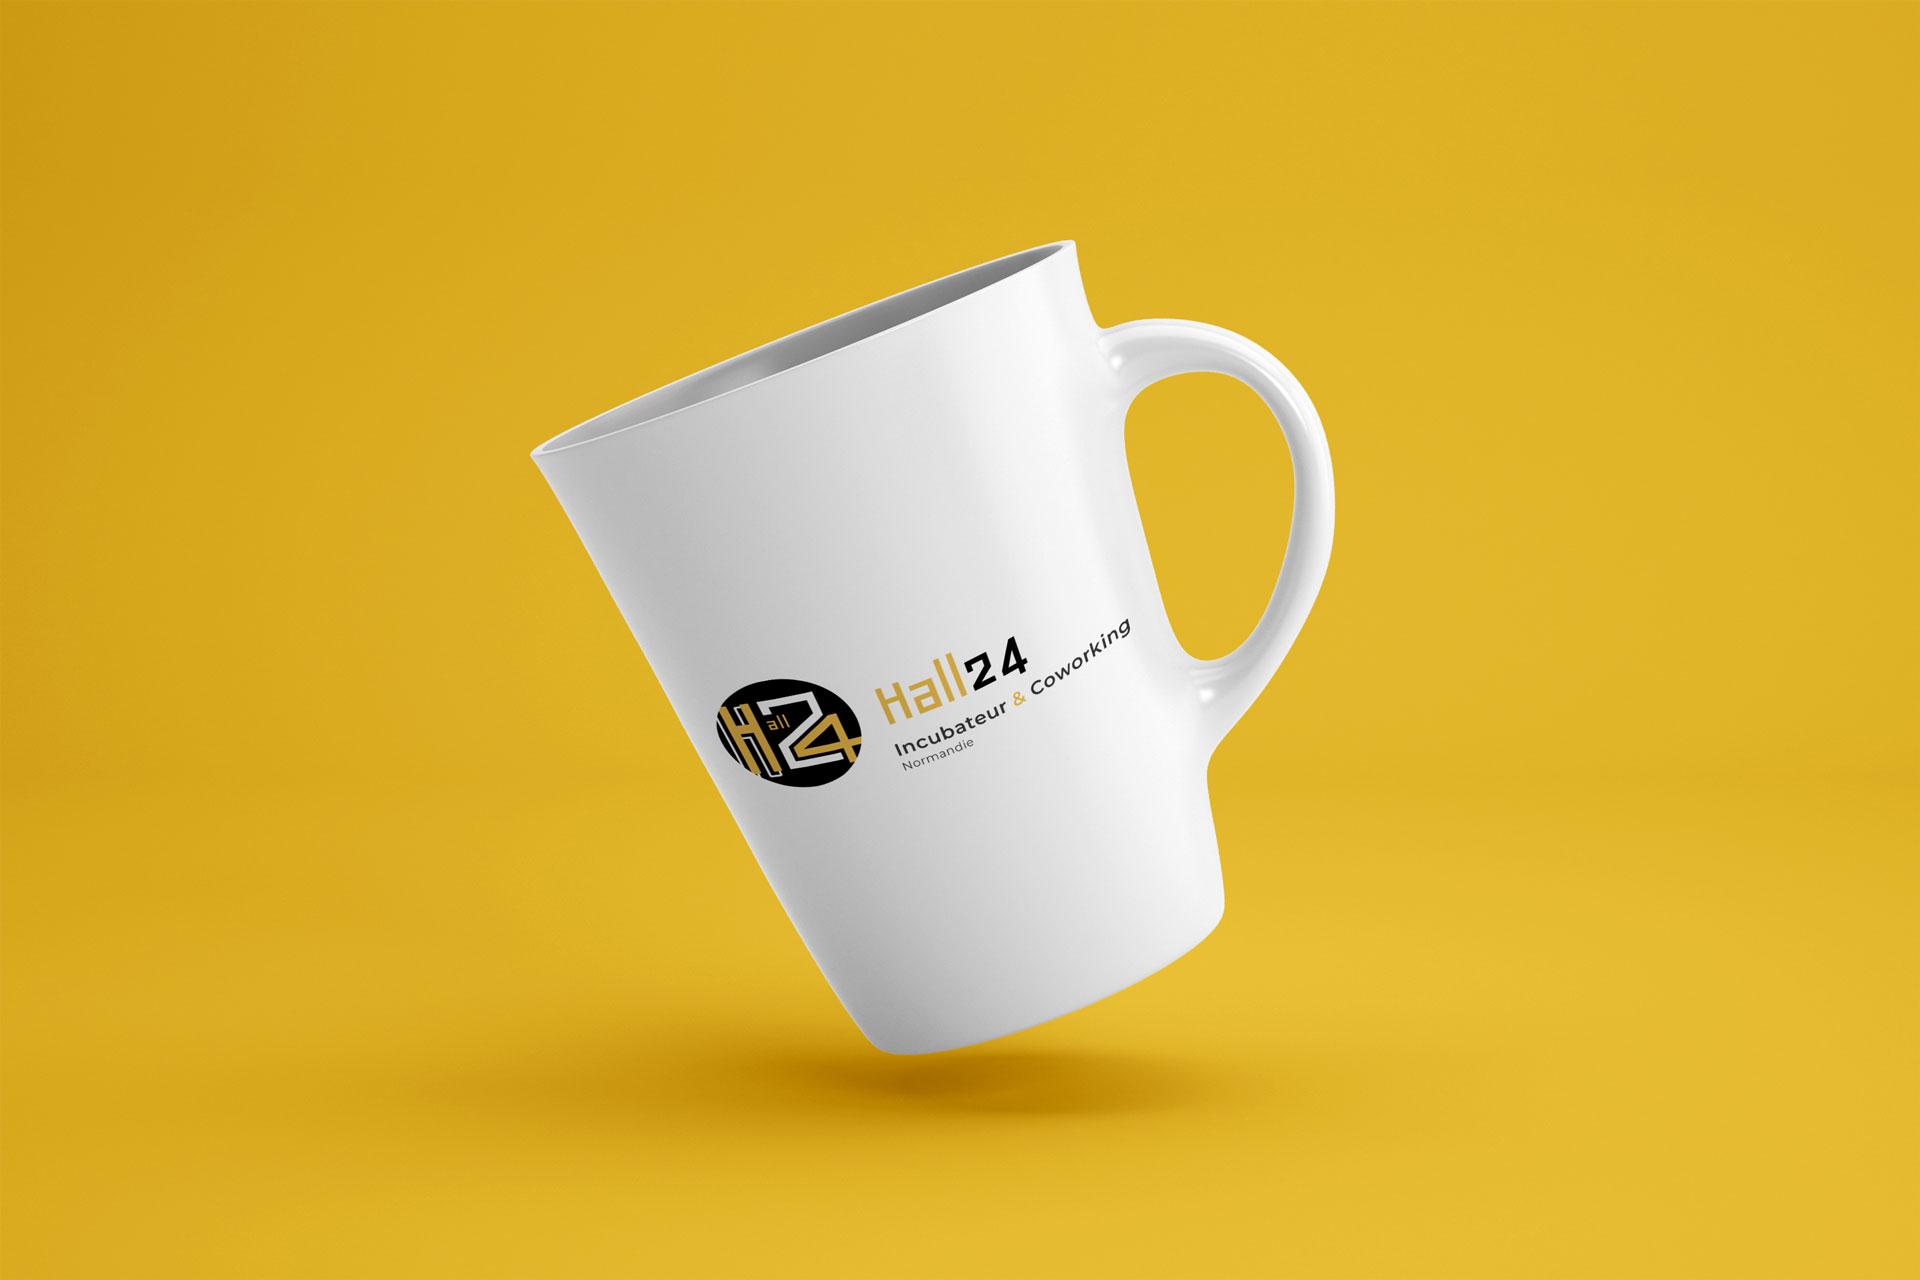 mockup logo hall 24rouen client i-media agence de communication digitale